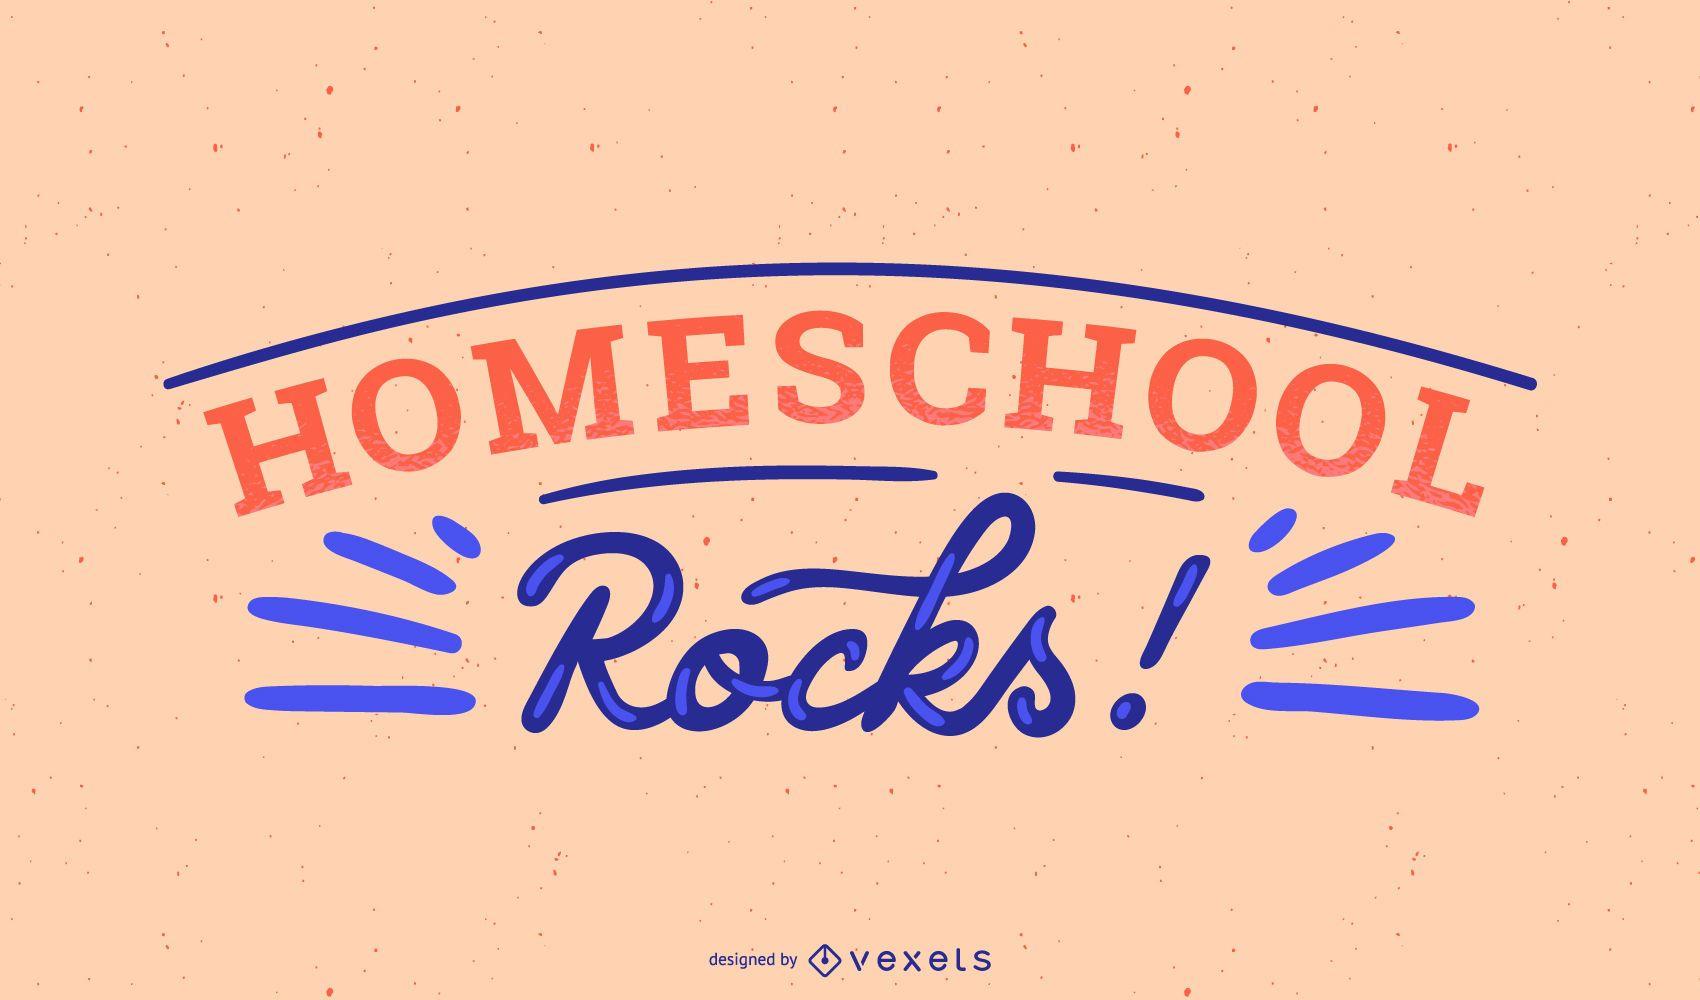 Homeschool rocks lettering design